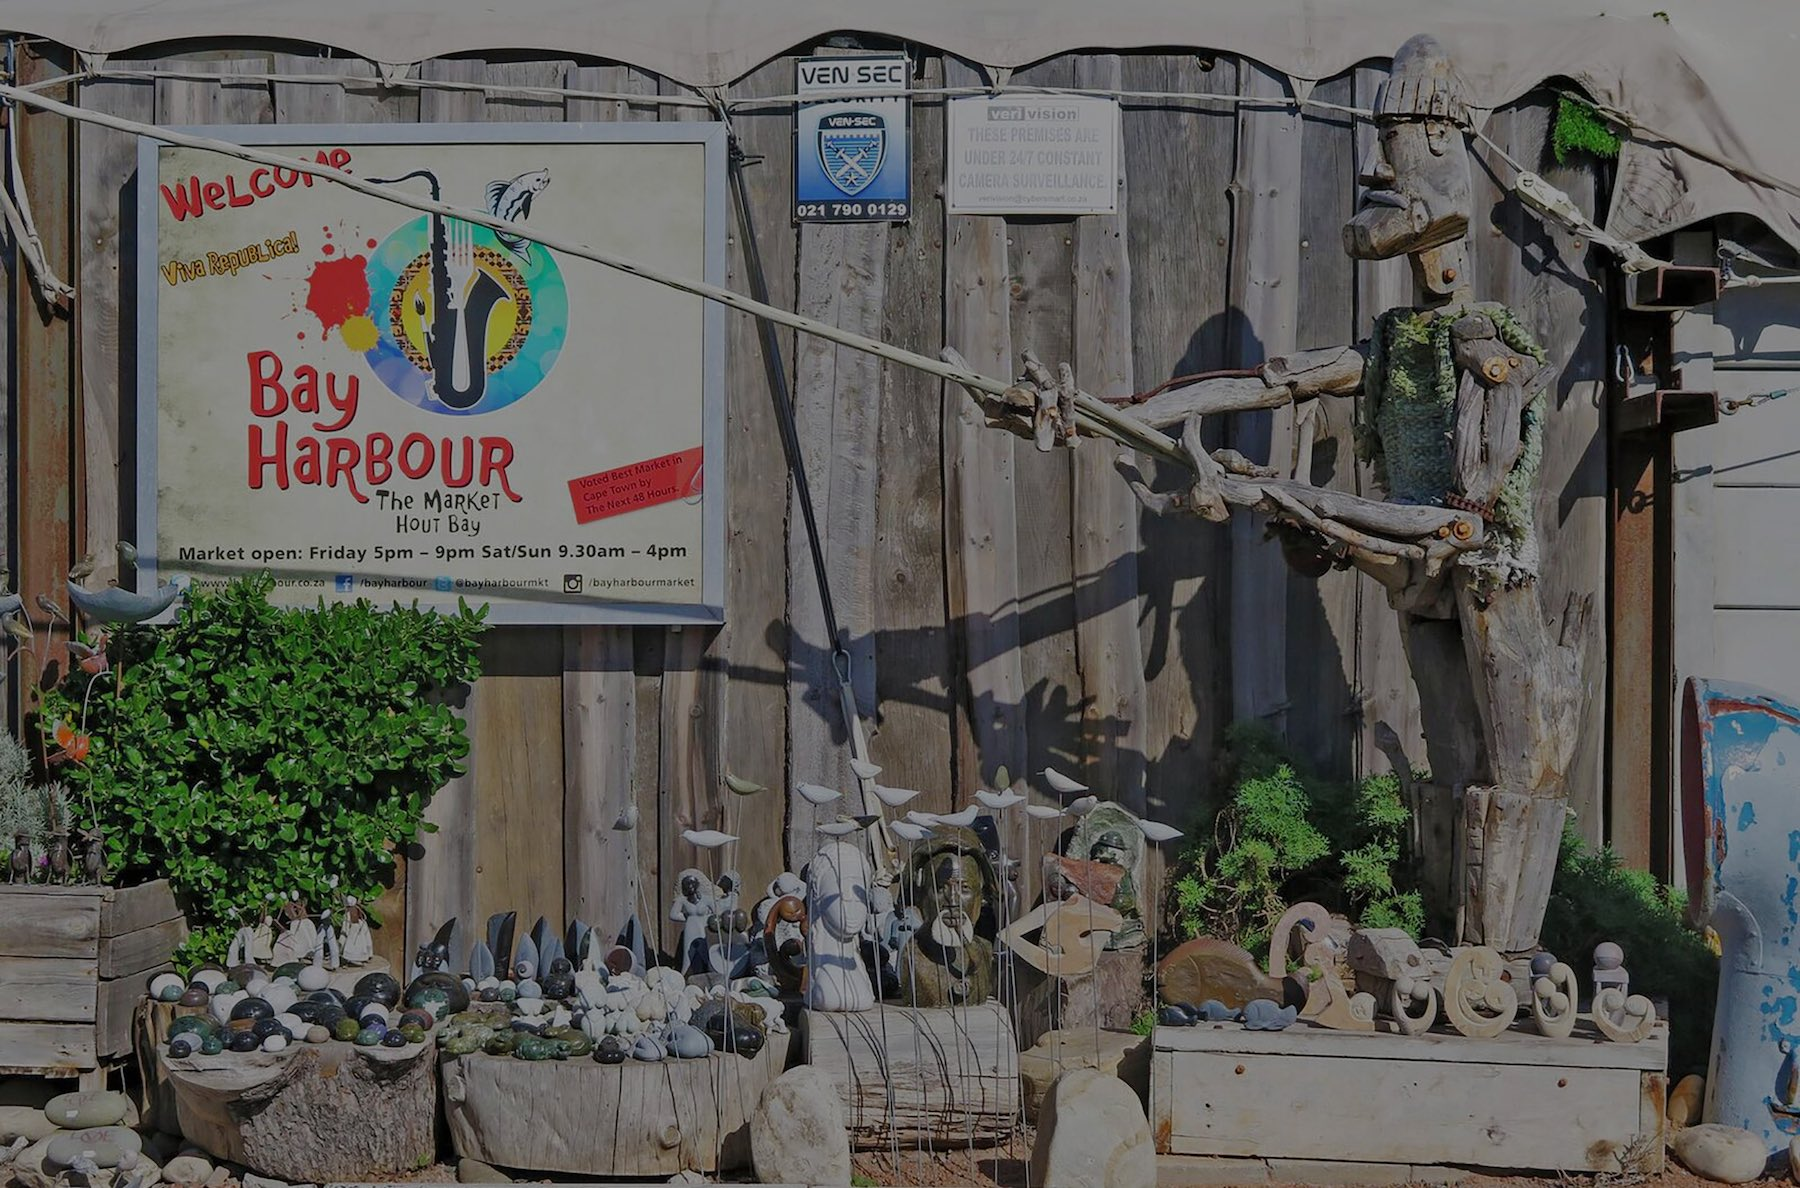 hout bay harbour market top image